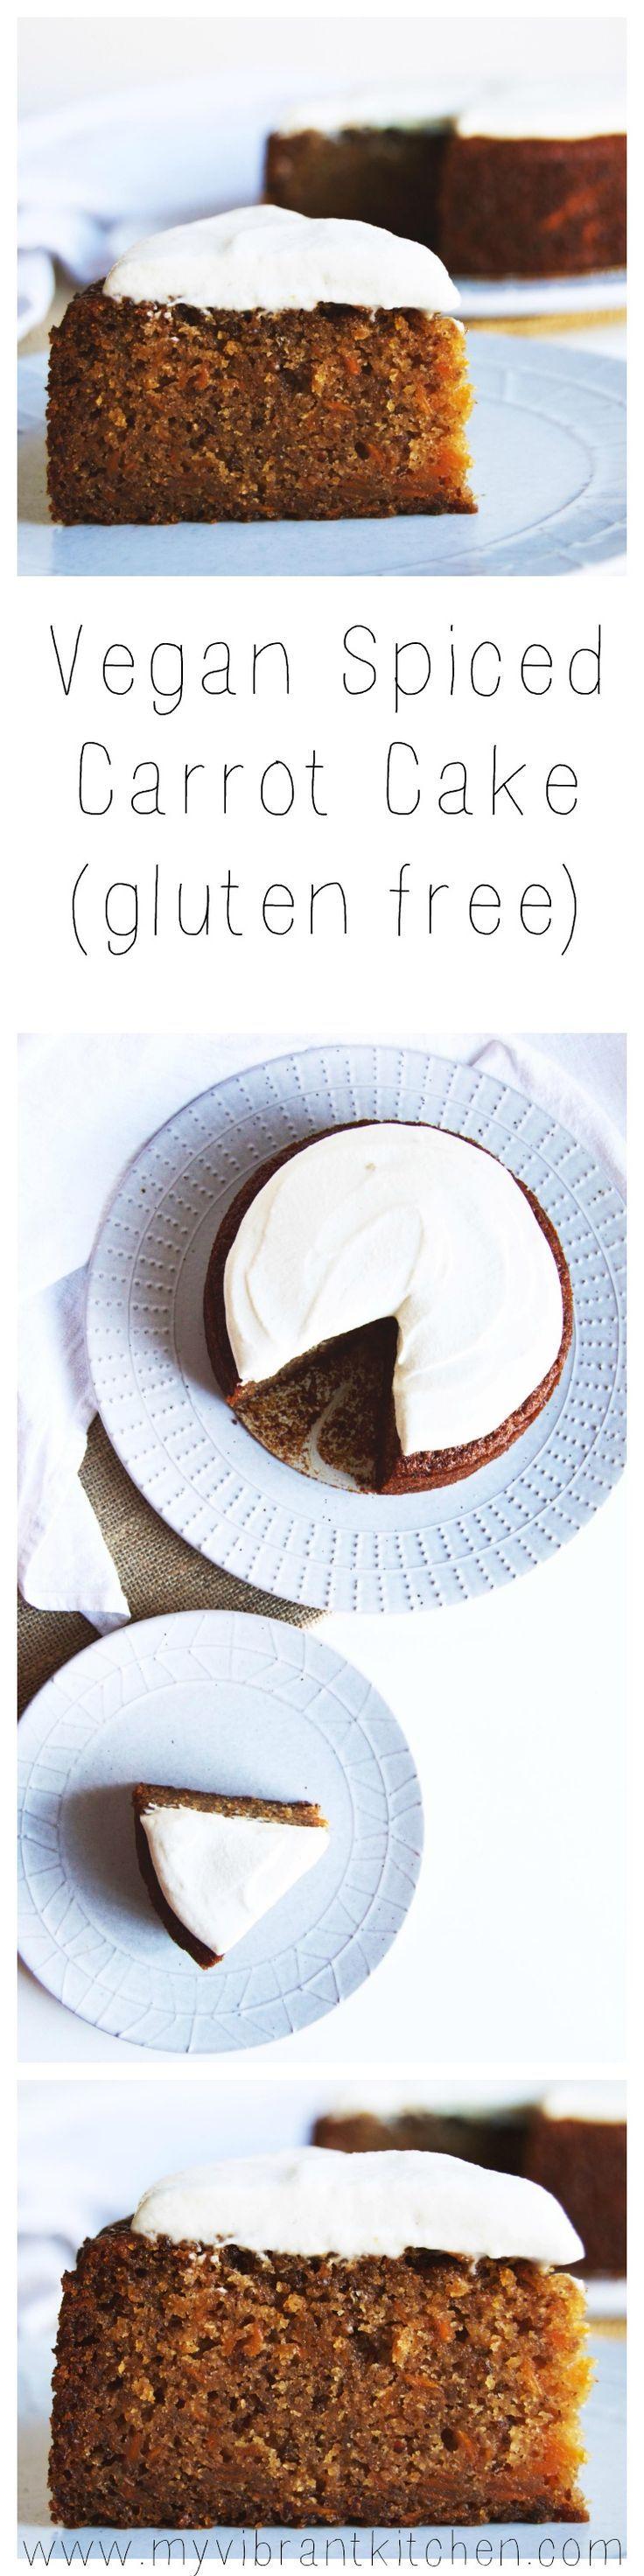 My Vibrant Kitchen   Vegan Spiced Carrot Cake (gluten free)   http://myvibrantkitchen.com